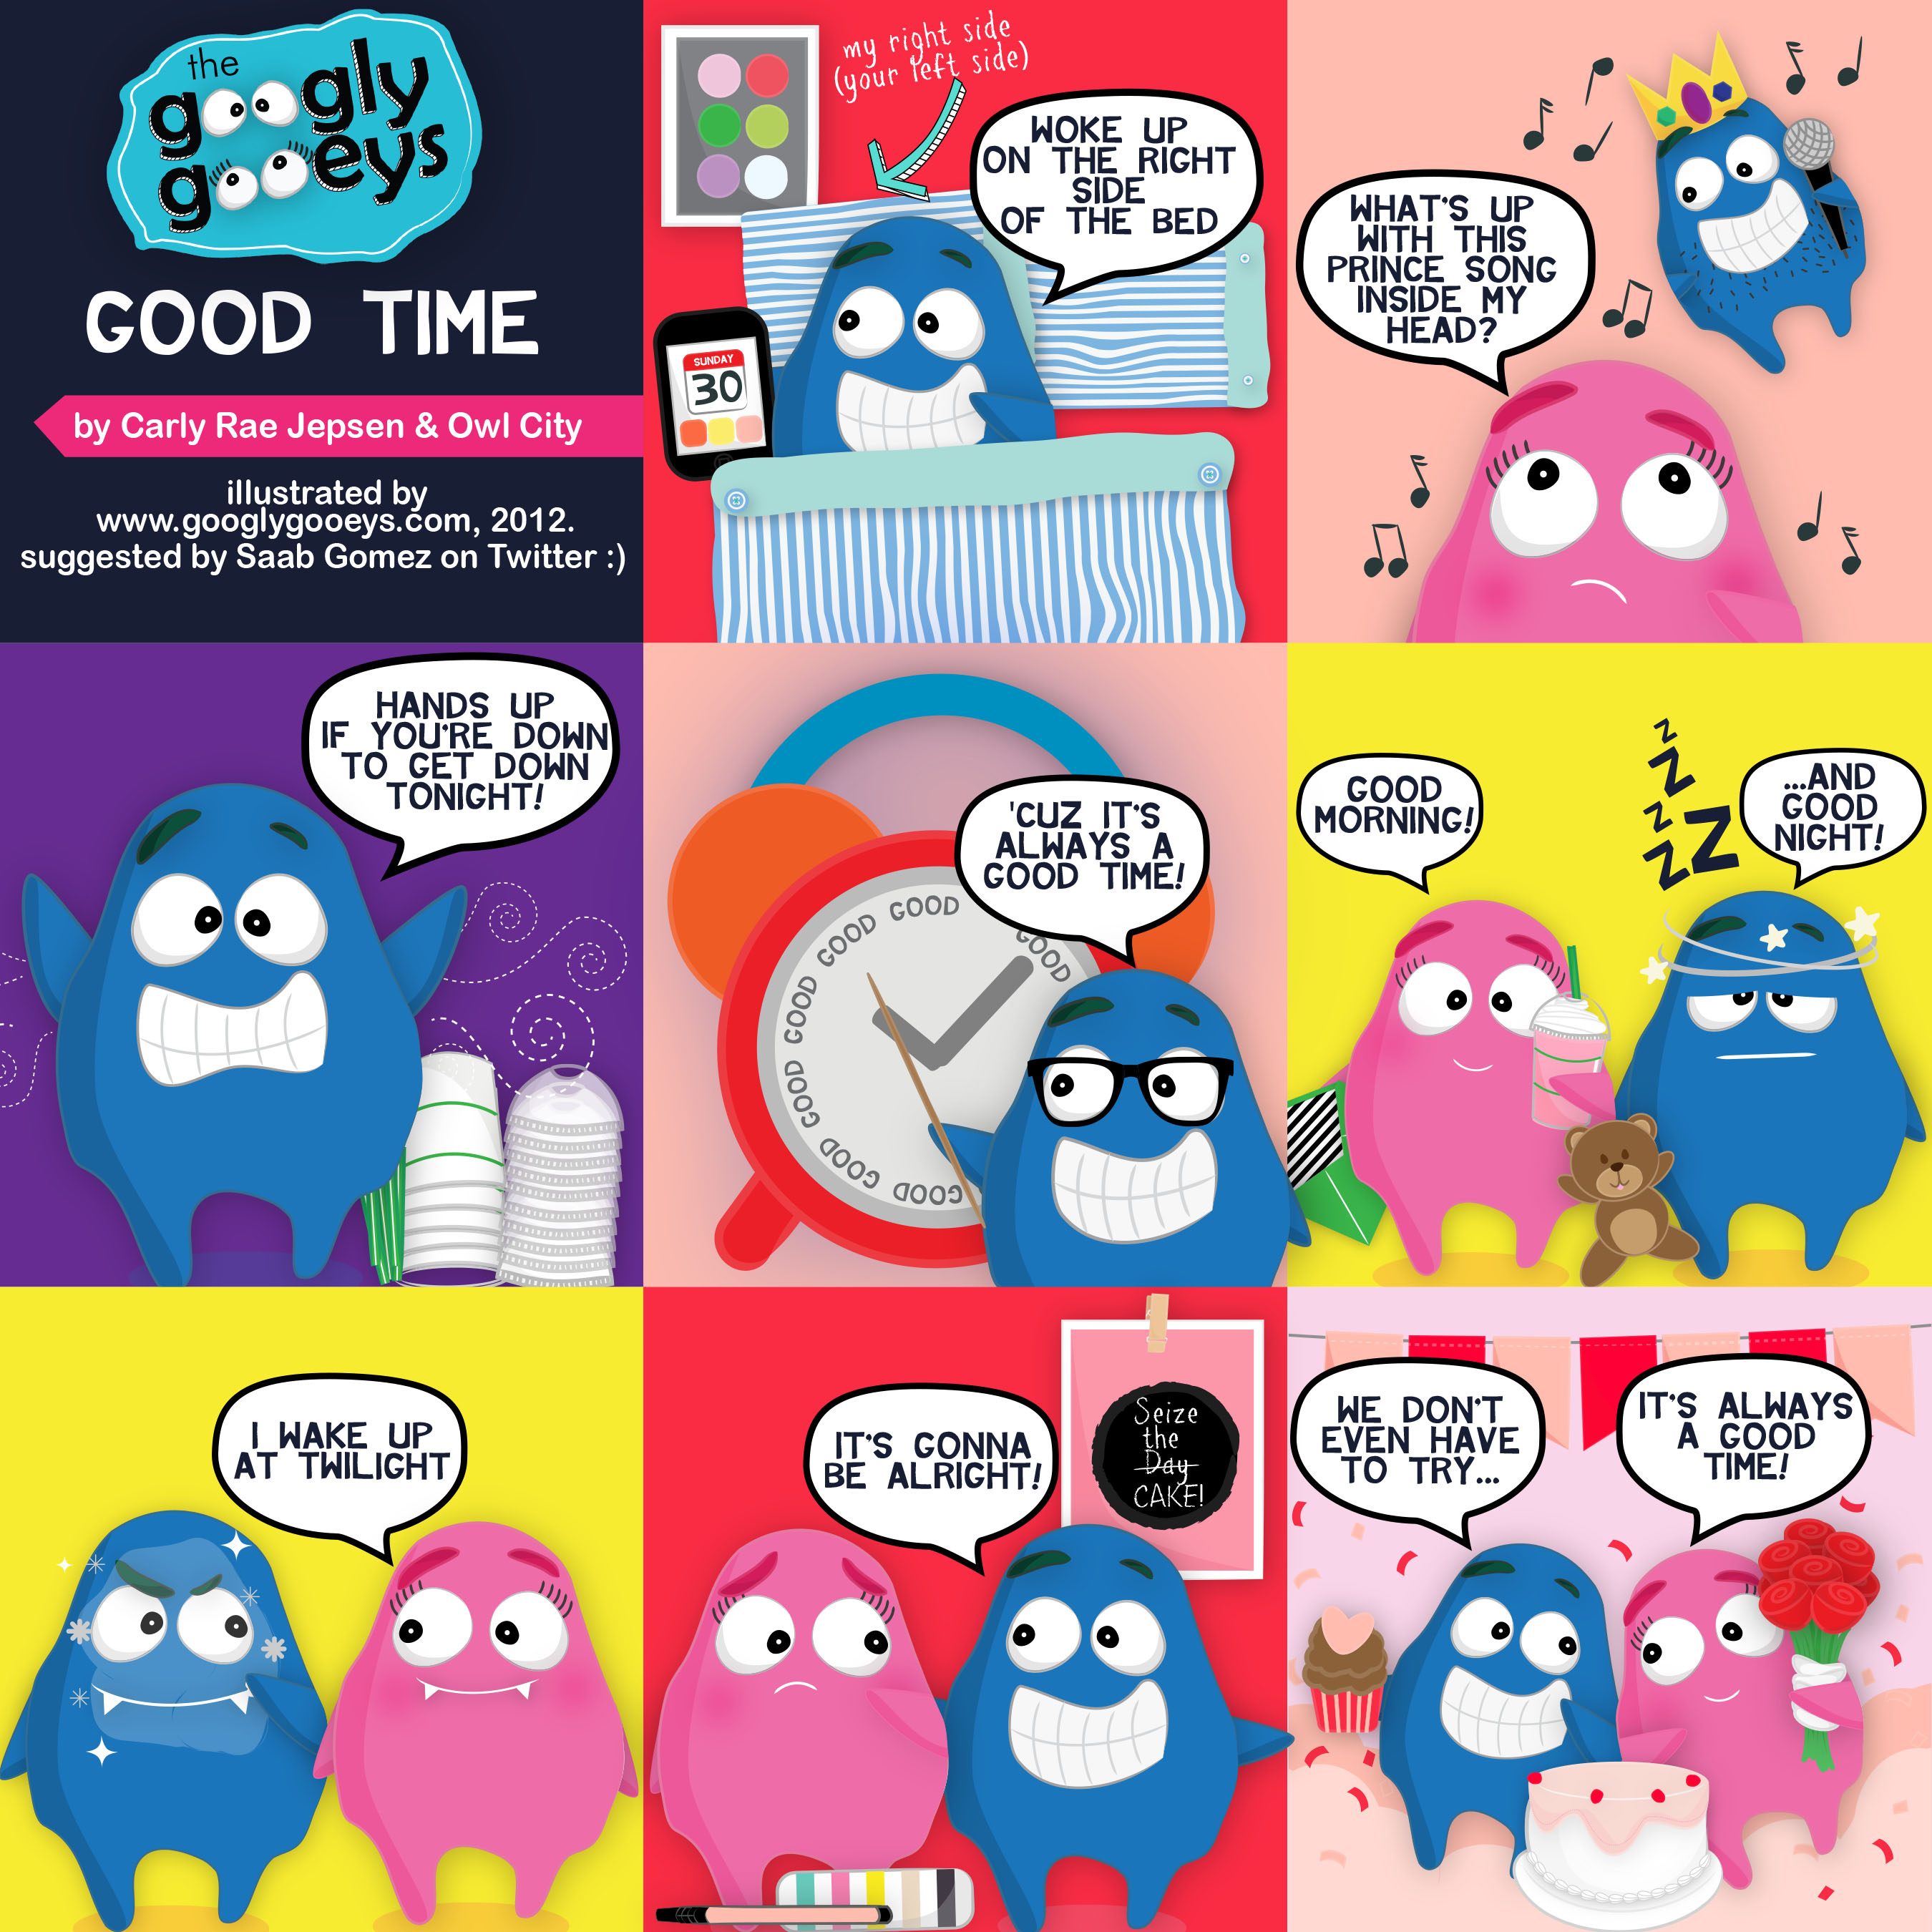 Good Time Lyrics Illustrated (Sung by Owl City & Carly Rae Jepsen)